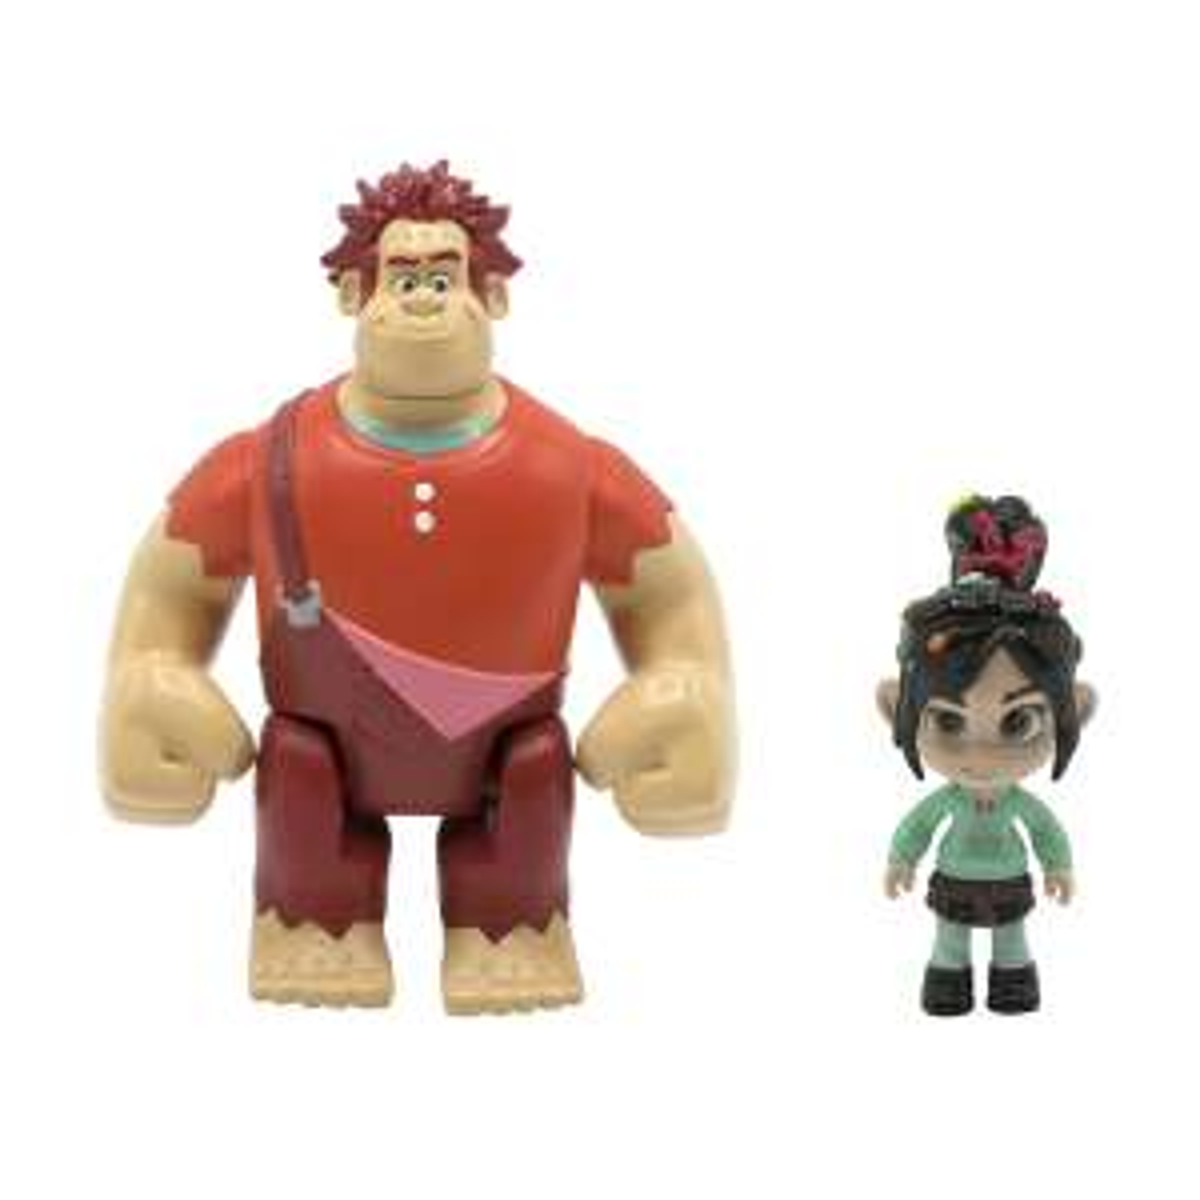 Chedraui Figuras Basicas Wifi Ralph 2 de Disney